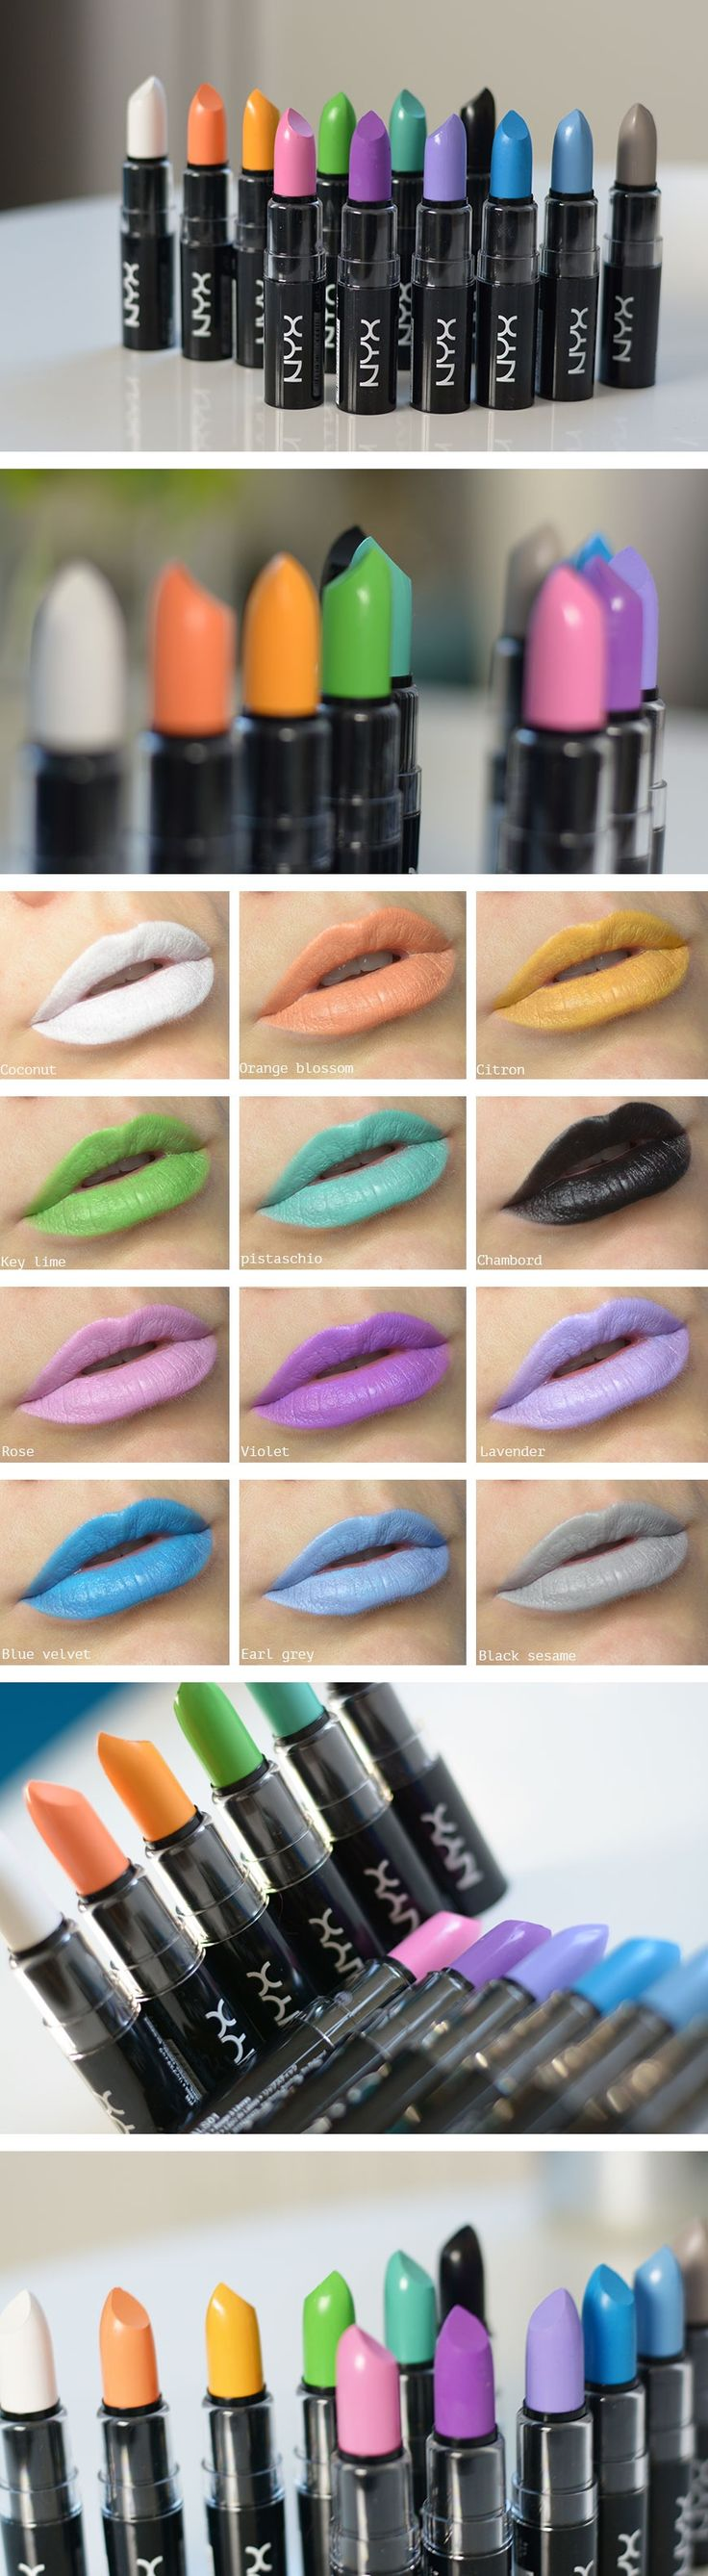 Linda gillar: Macaron Lippies - must buy the violet/purple!!!